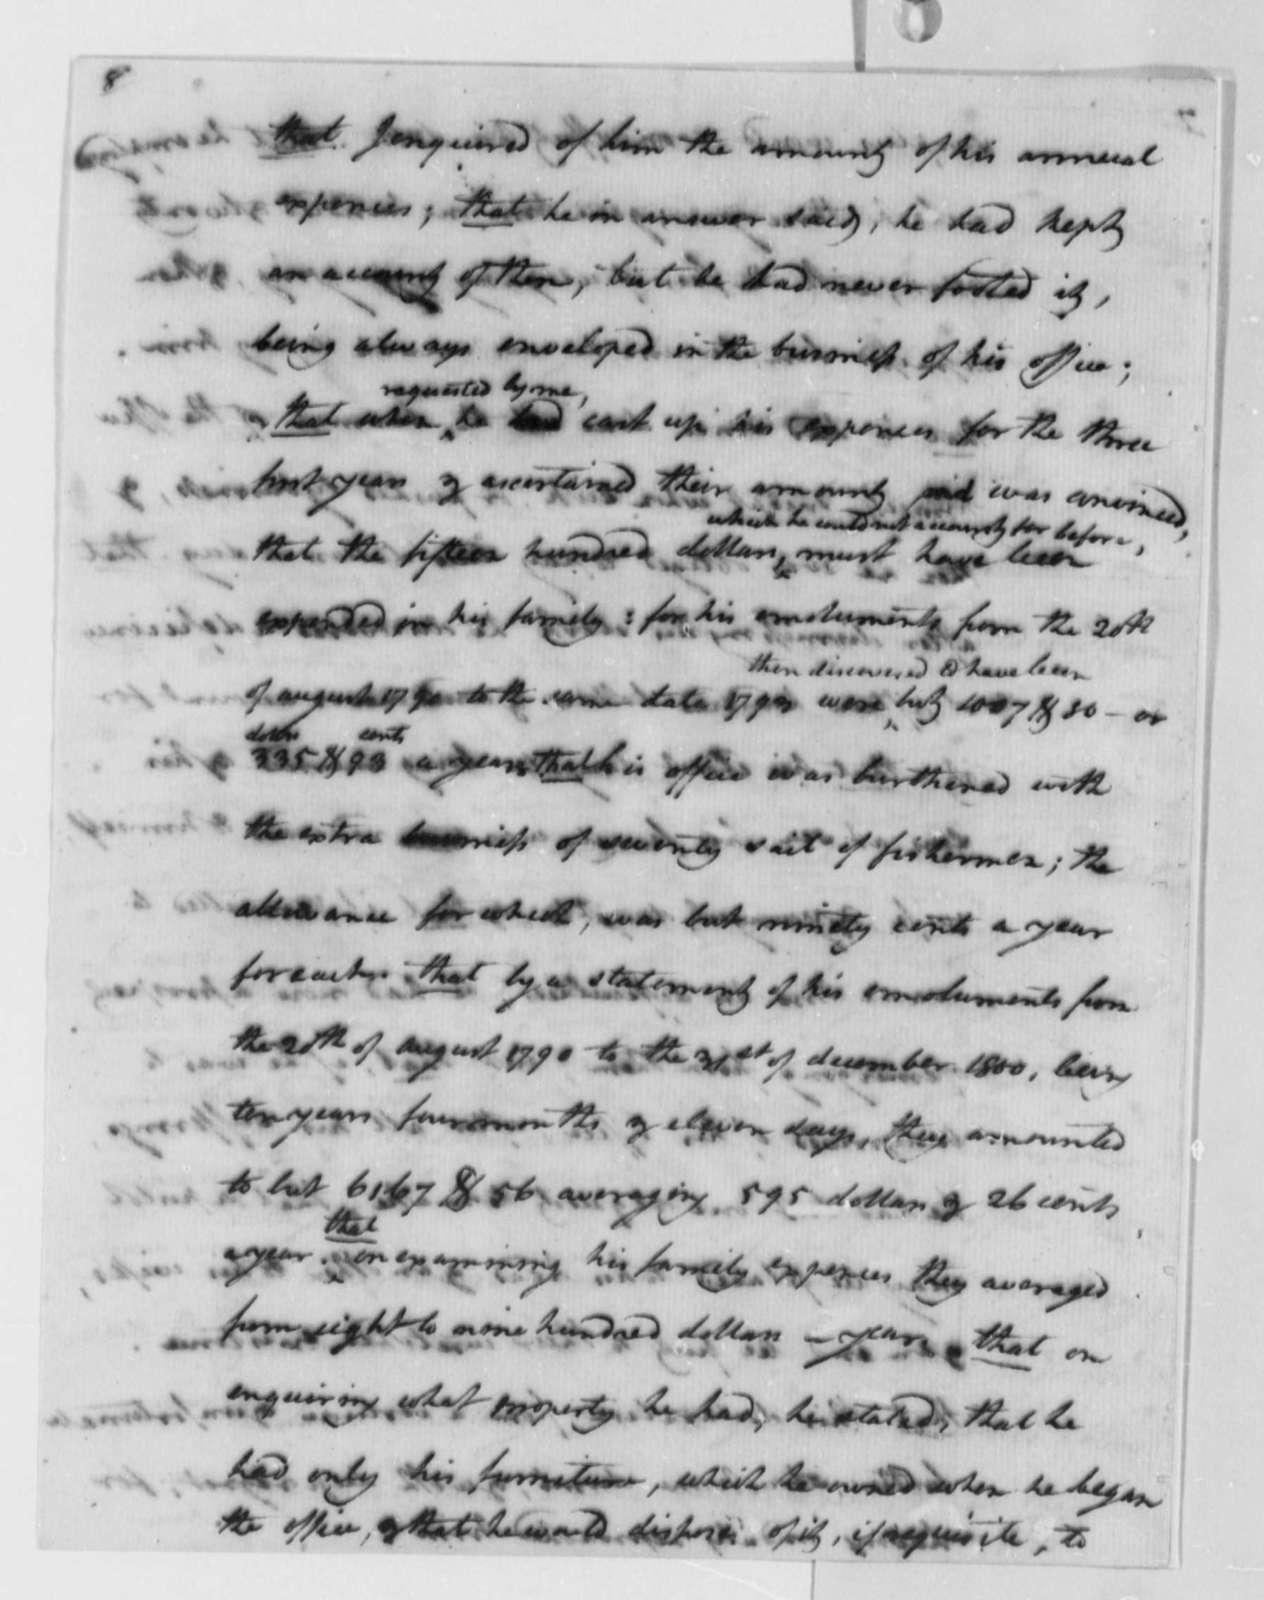 Elbridge Gerry to Thomas Jefferson, August 9, 1802